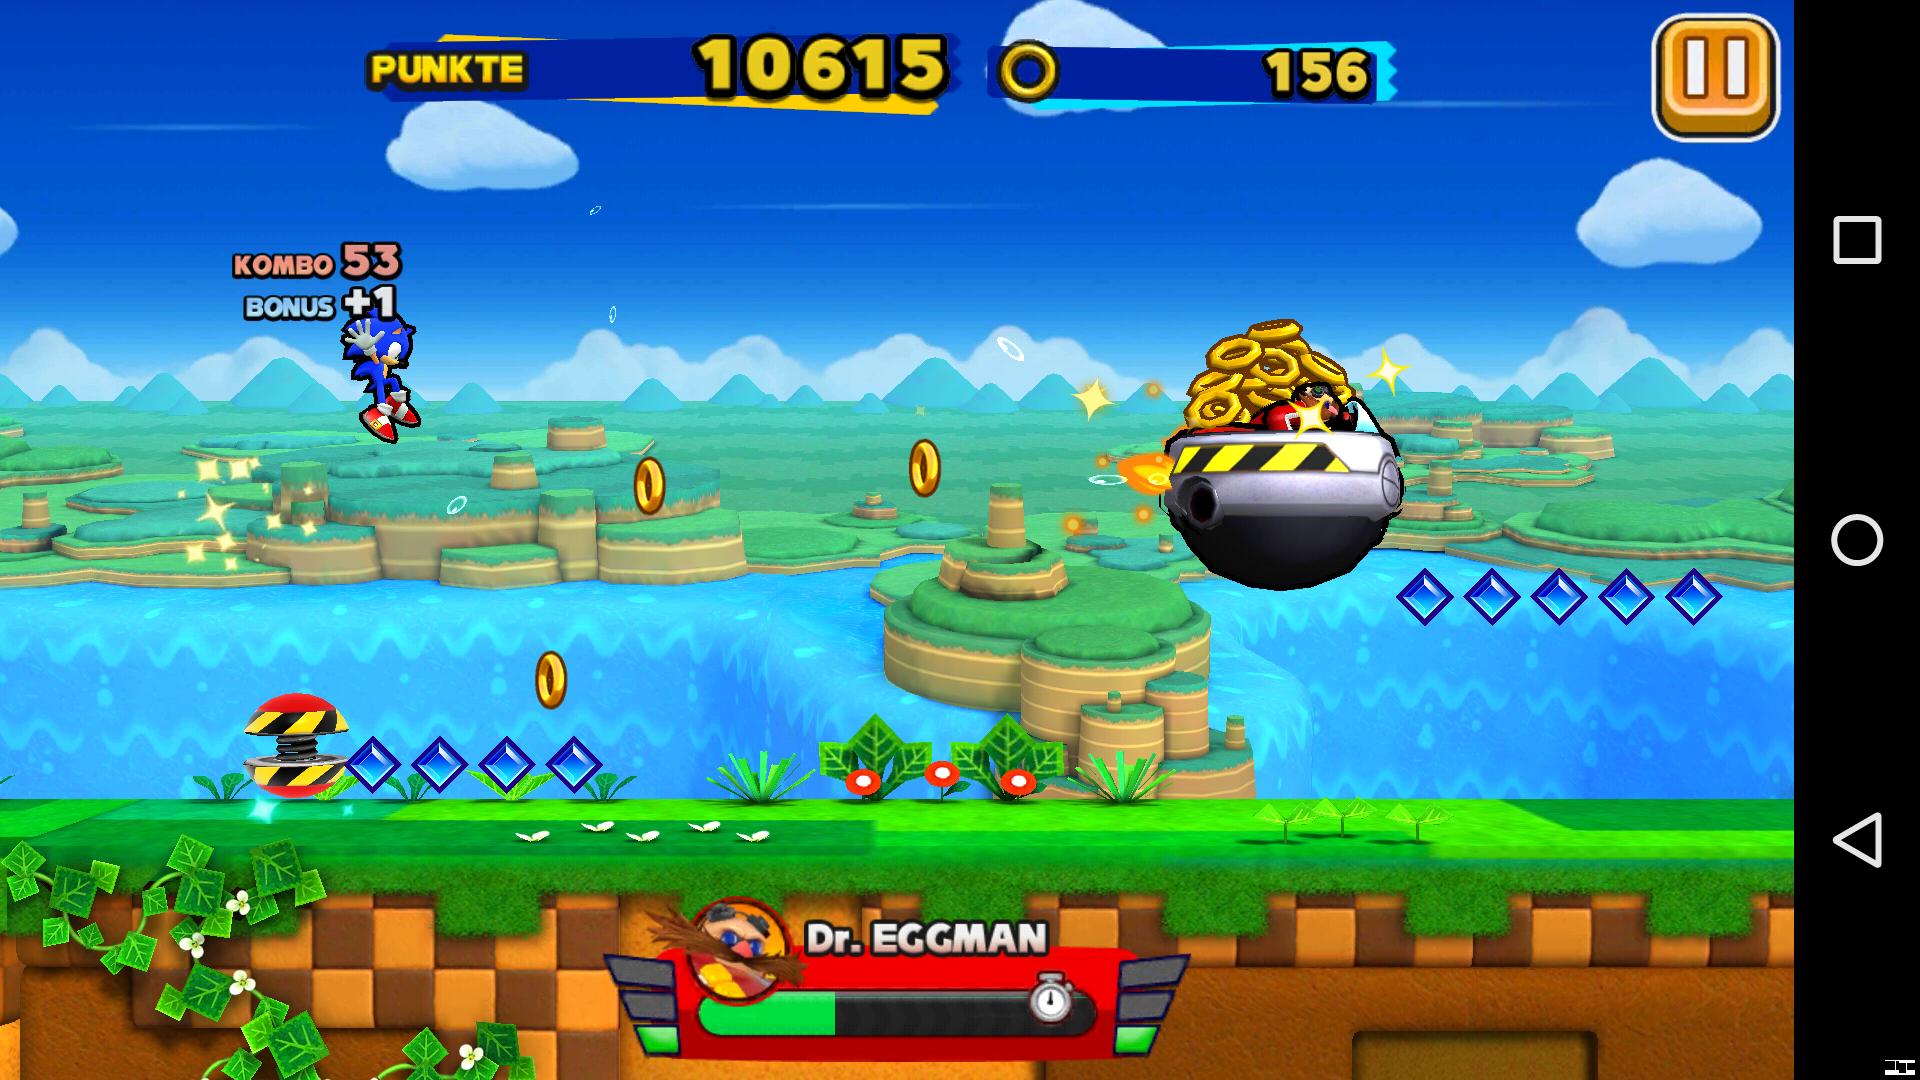 Sonic Runners Neuer Endlos Runner Im Klassischen 2d Gewand Giga